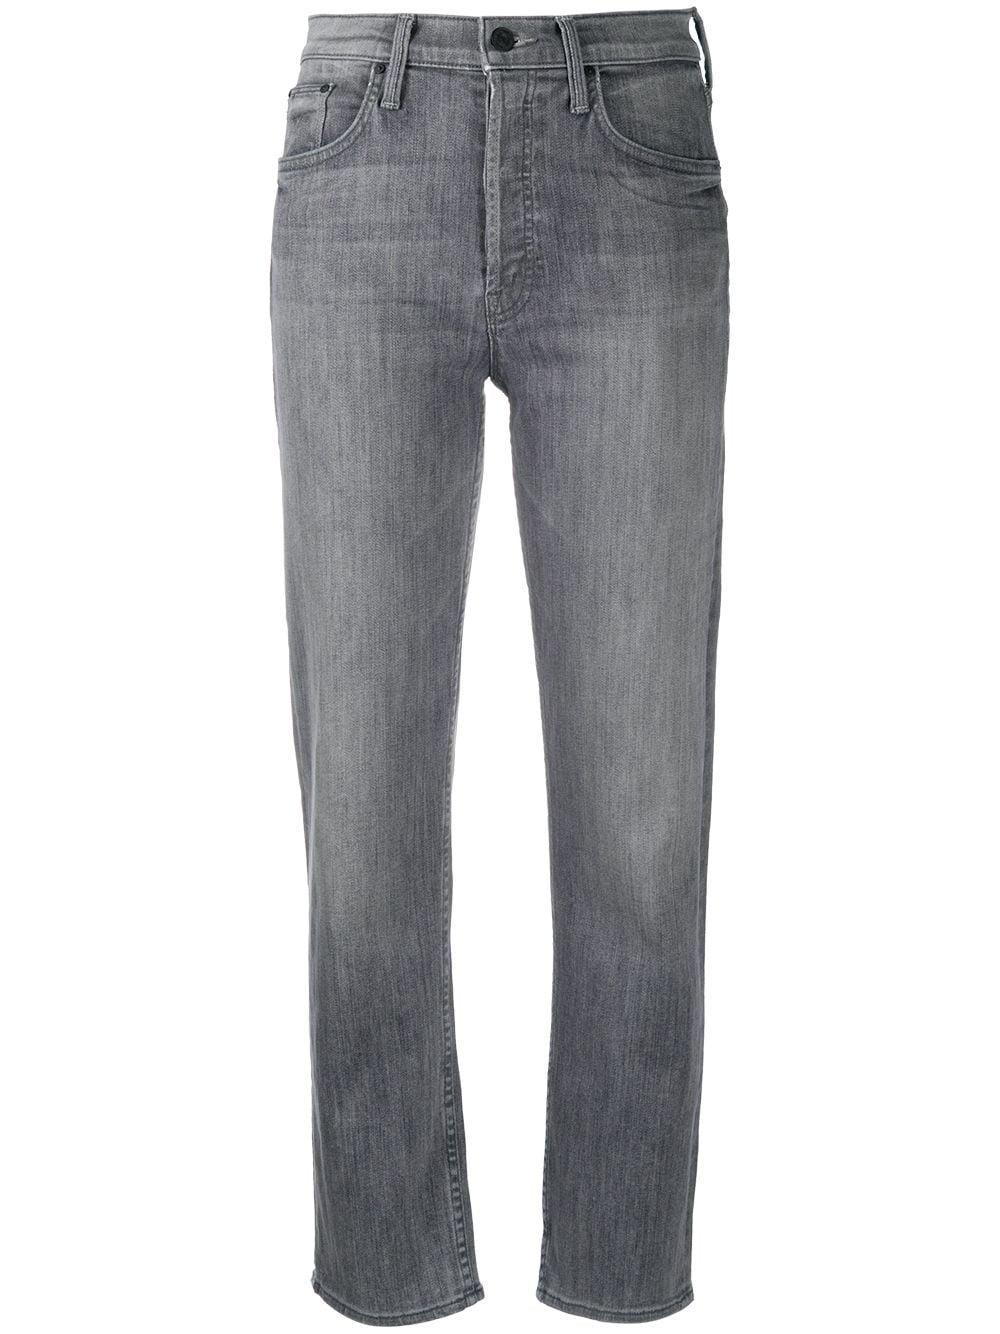 Tomcat Ankle Jean Item # 1664-394